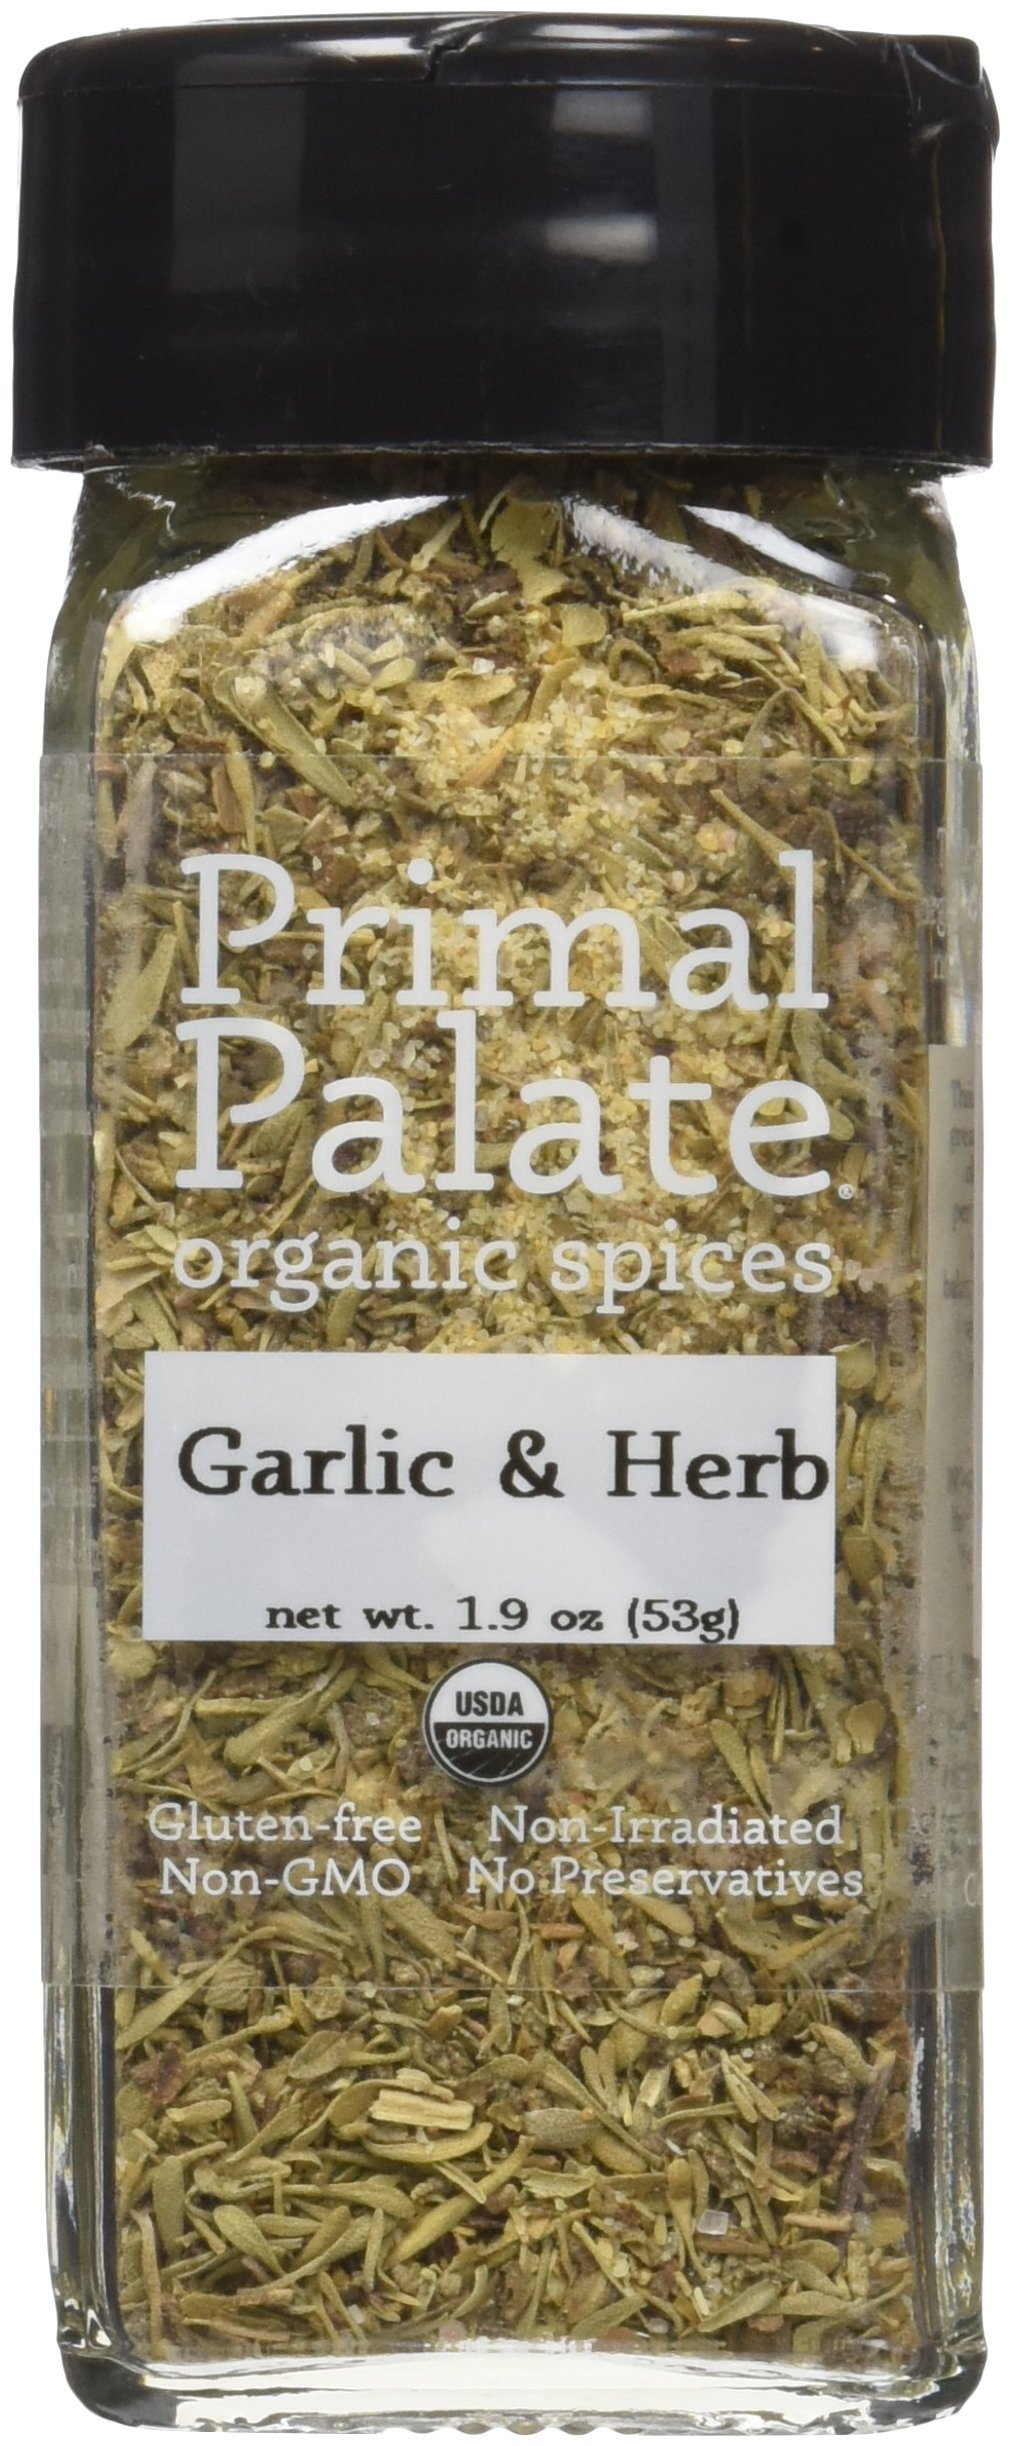 Primal Palate Organic Spices Garlic & Herb, Certified Organic, 1.9 oz Bottle